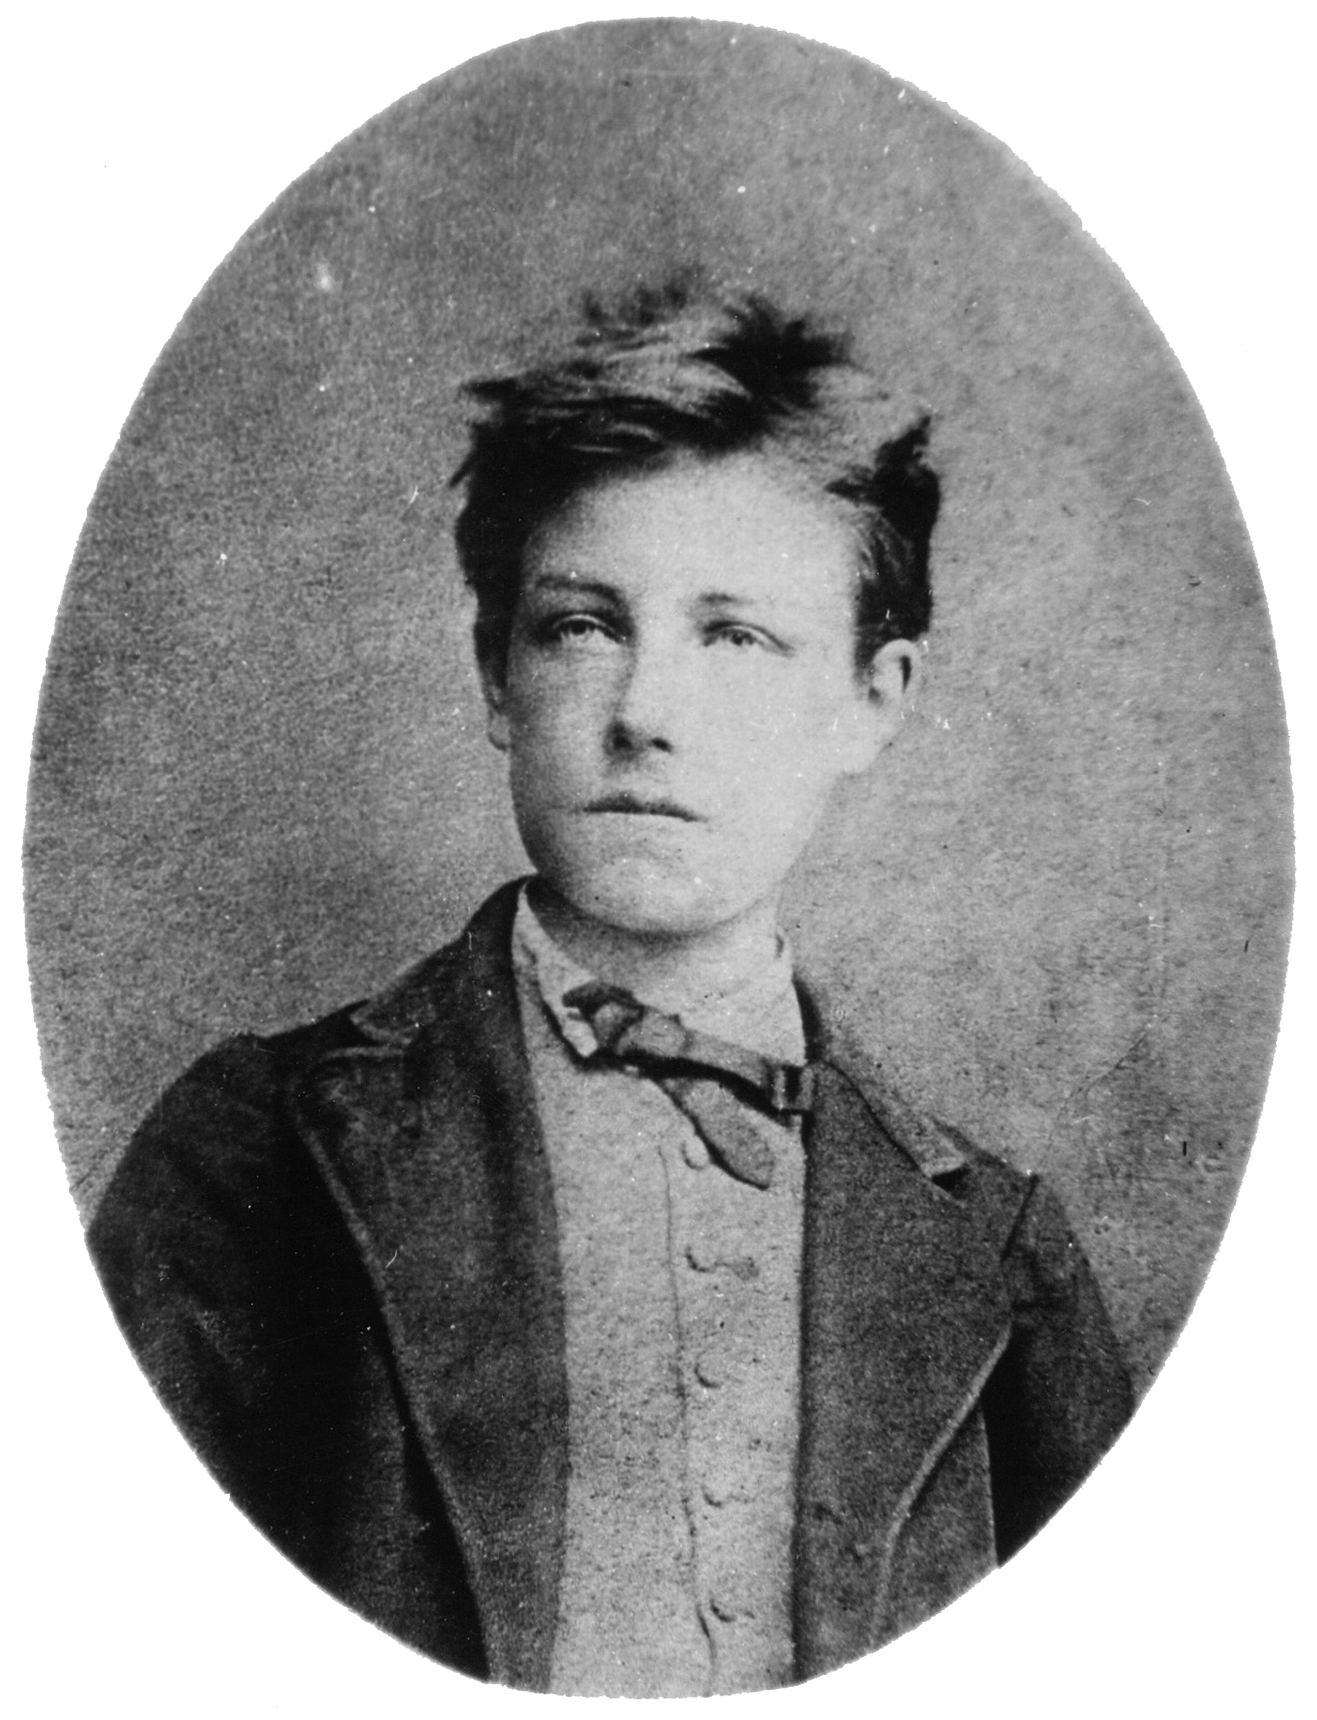 Arthur_Rimbaud_by_Carjat_-_Musée_Arthur_Rimbaud